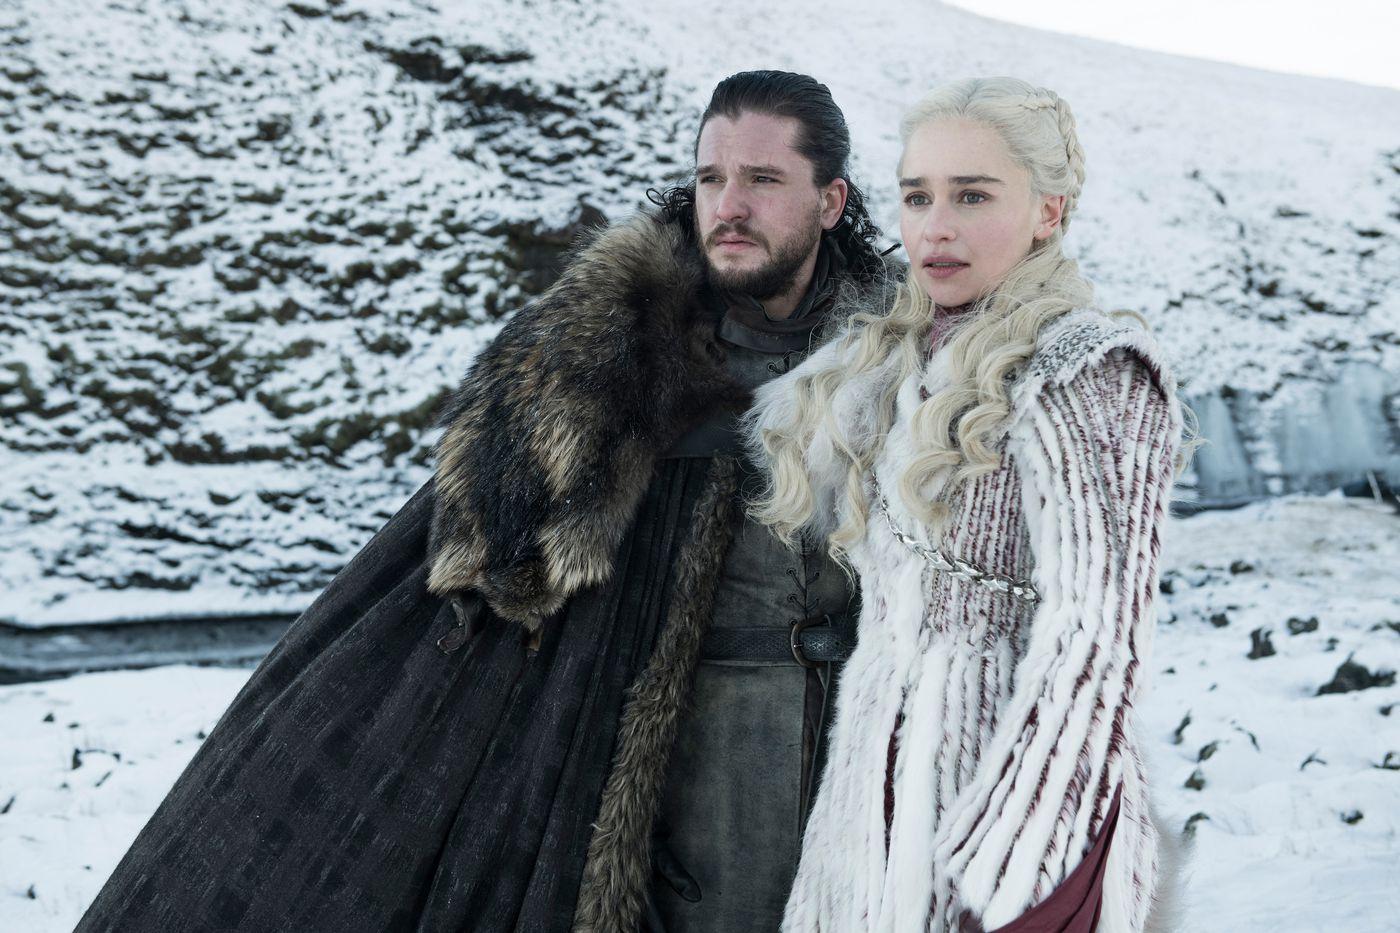 Jon Snow and Daenerys Targaryen in Game of Thrones. Credit: HBO